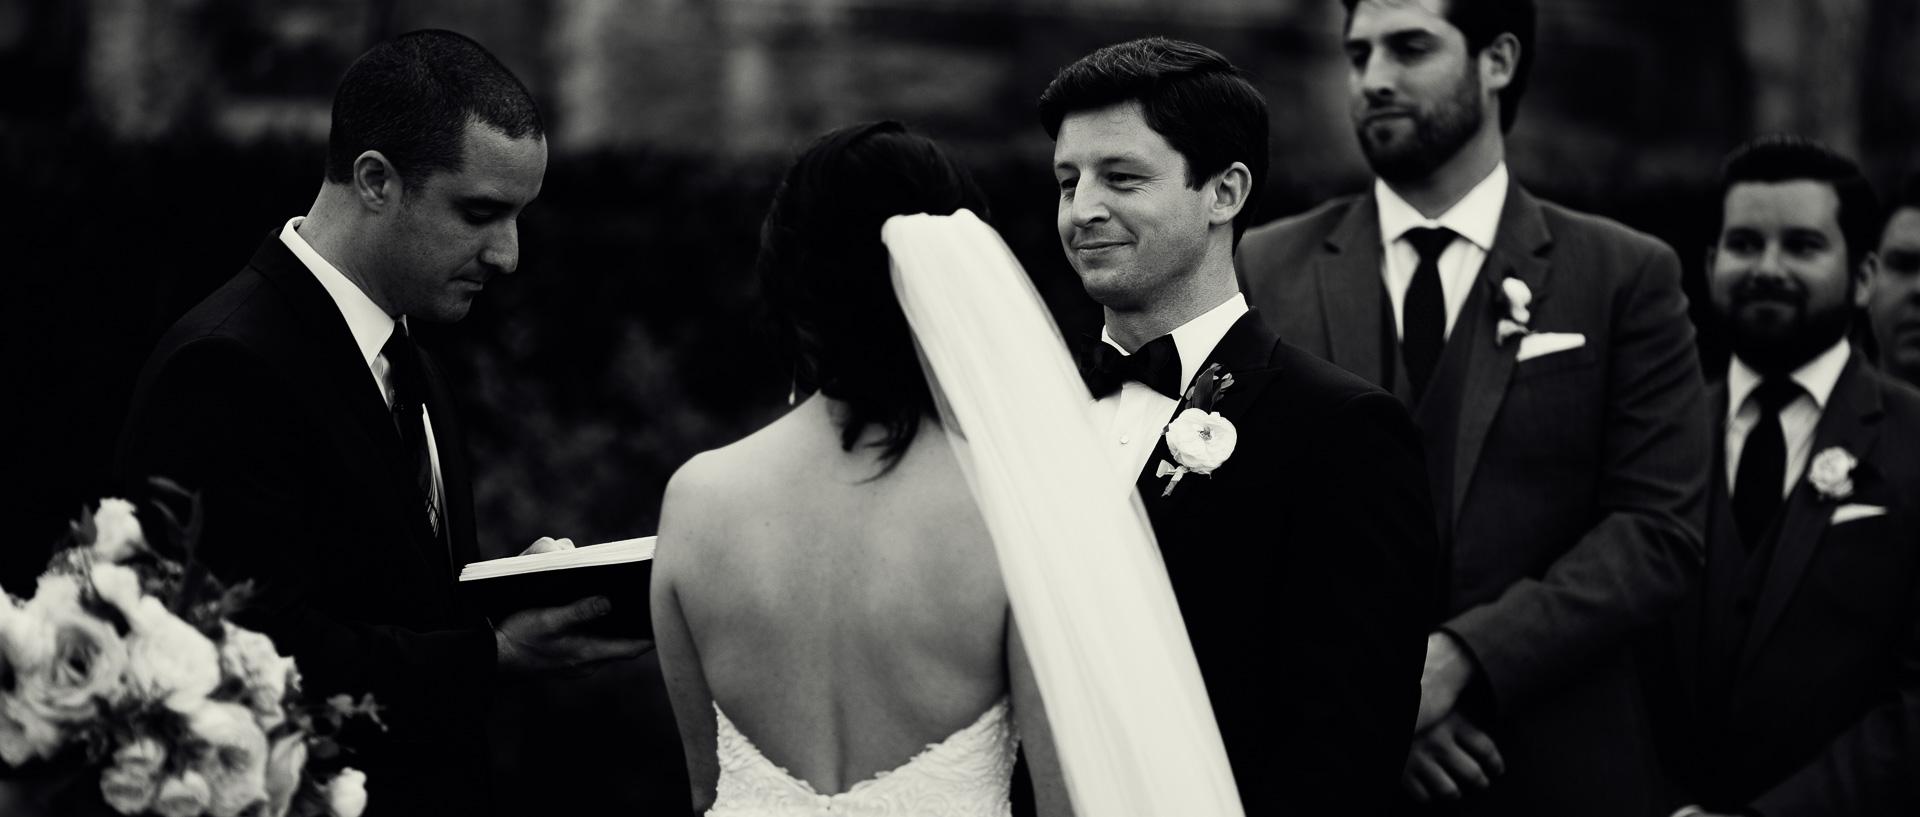 16 - wedding X - B-7010 - wide - IMG_0778.jpg